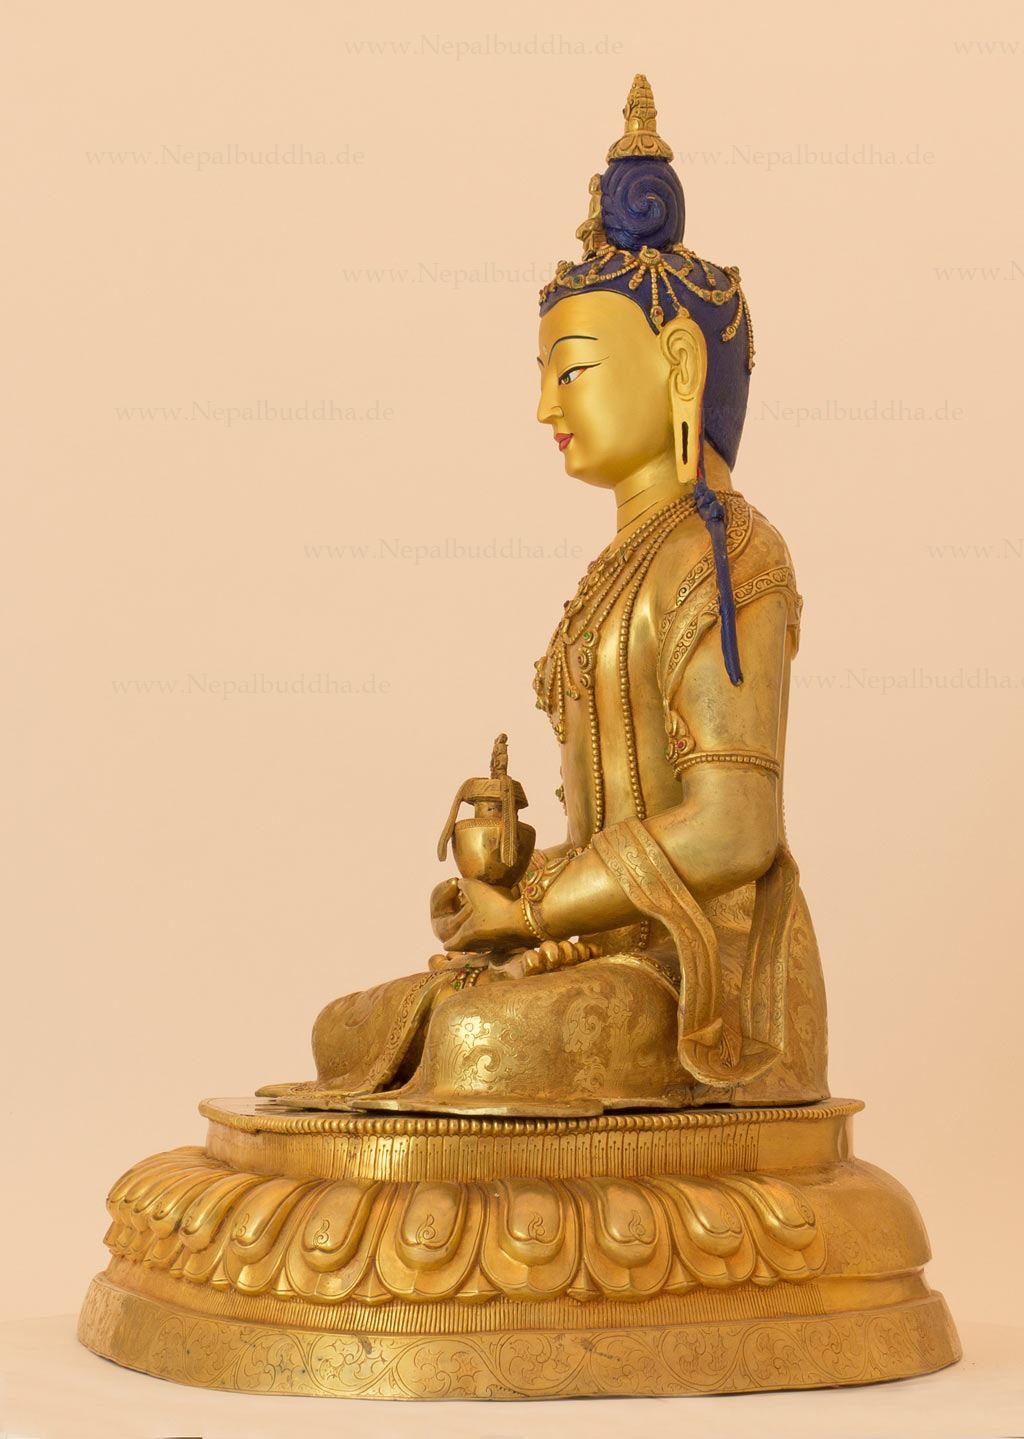 bouddha amitabha sculpture or 16 5 kg chef d 39 uvre cire perdue stature nepal ebay. Black Bedroom Furniture Sets. Home Design Ideas